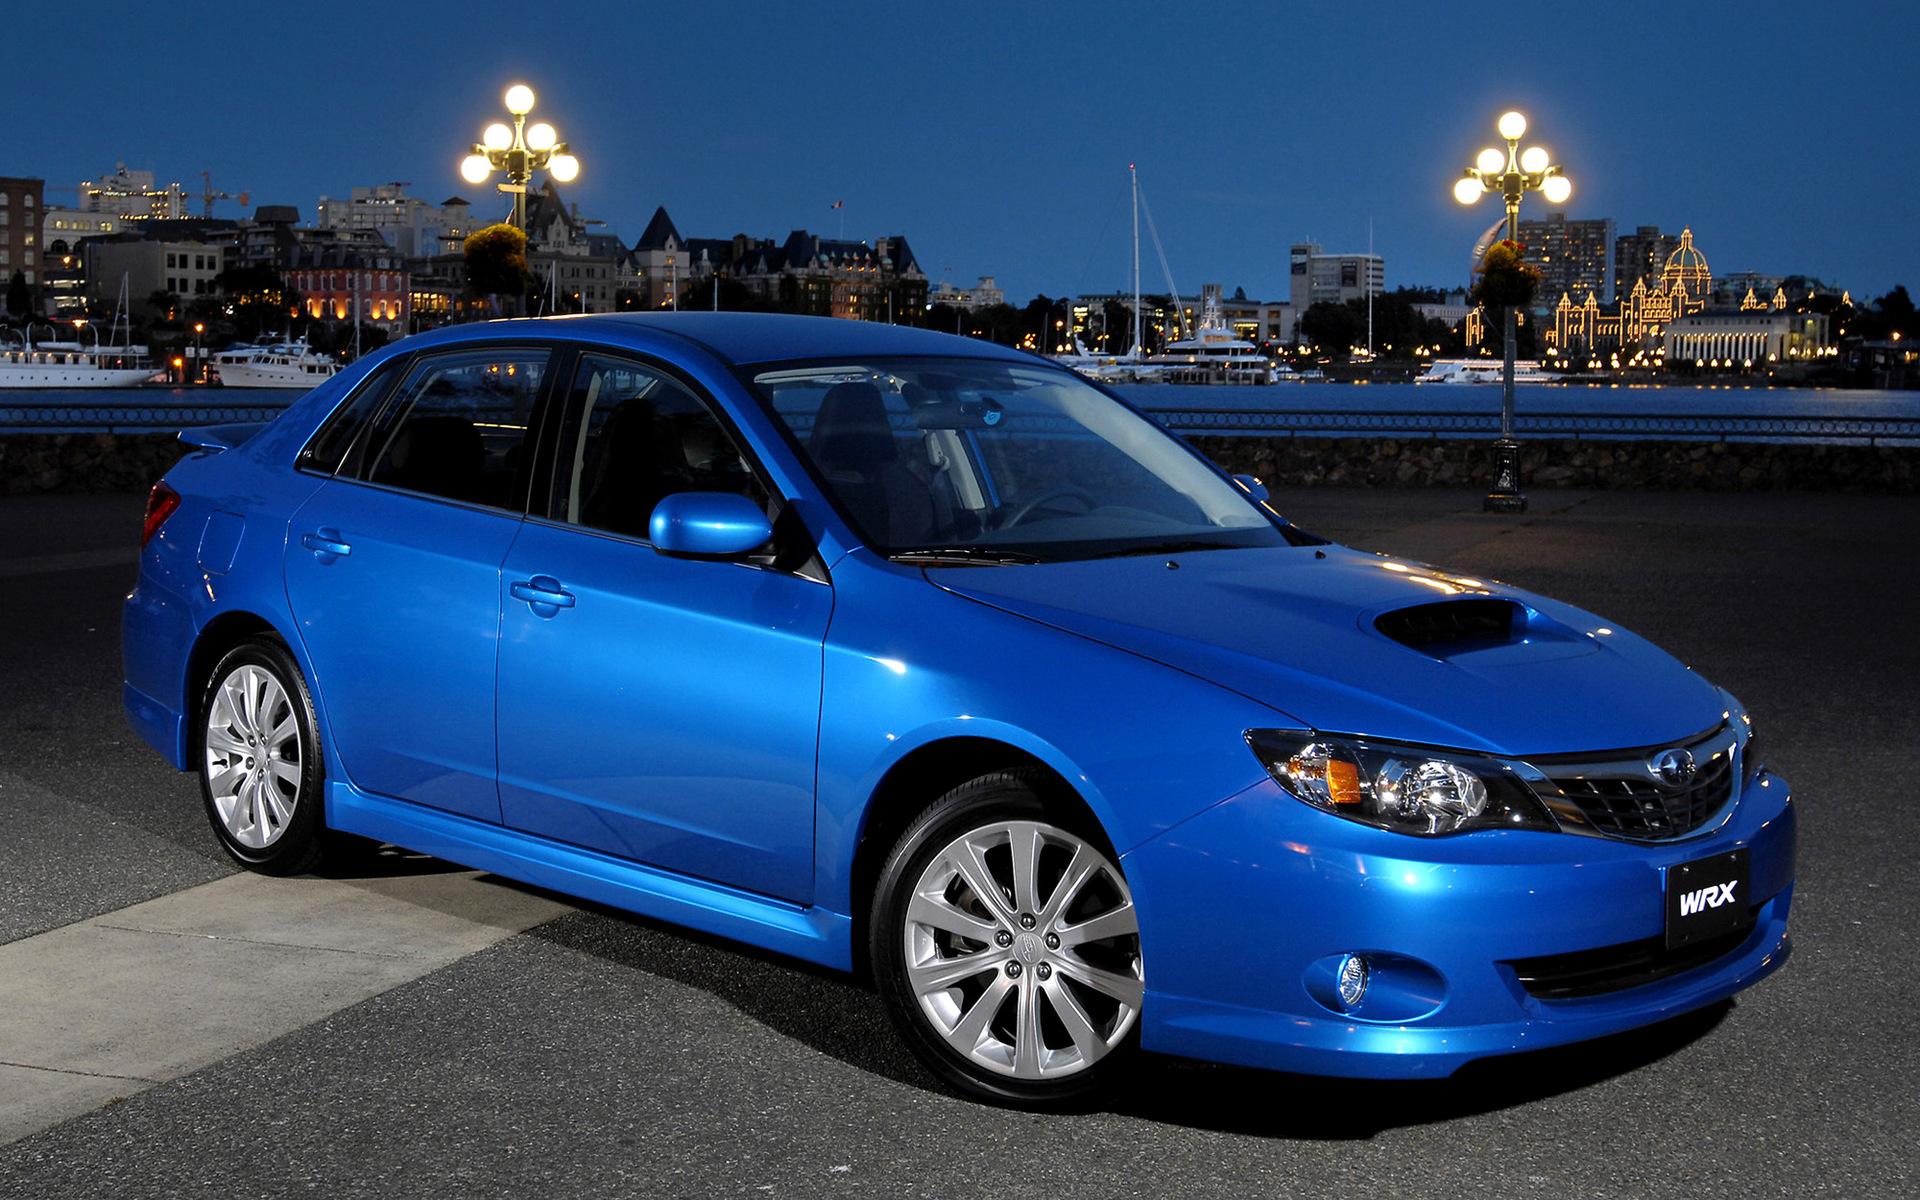 2007 Subaru Impreza Wrx Sti >> 2007 Subaru Impreza WRX Sedan (US) - Wallpapers and HD Images | Car Pixel